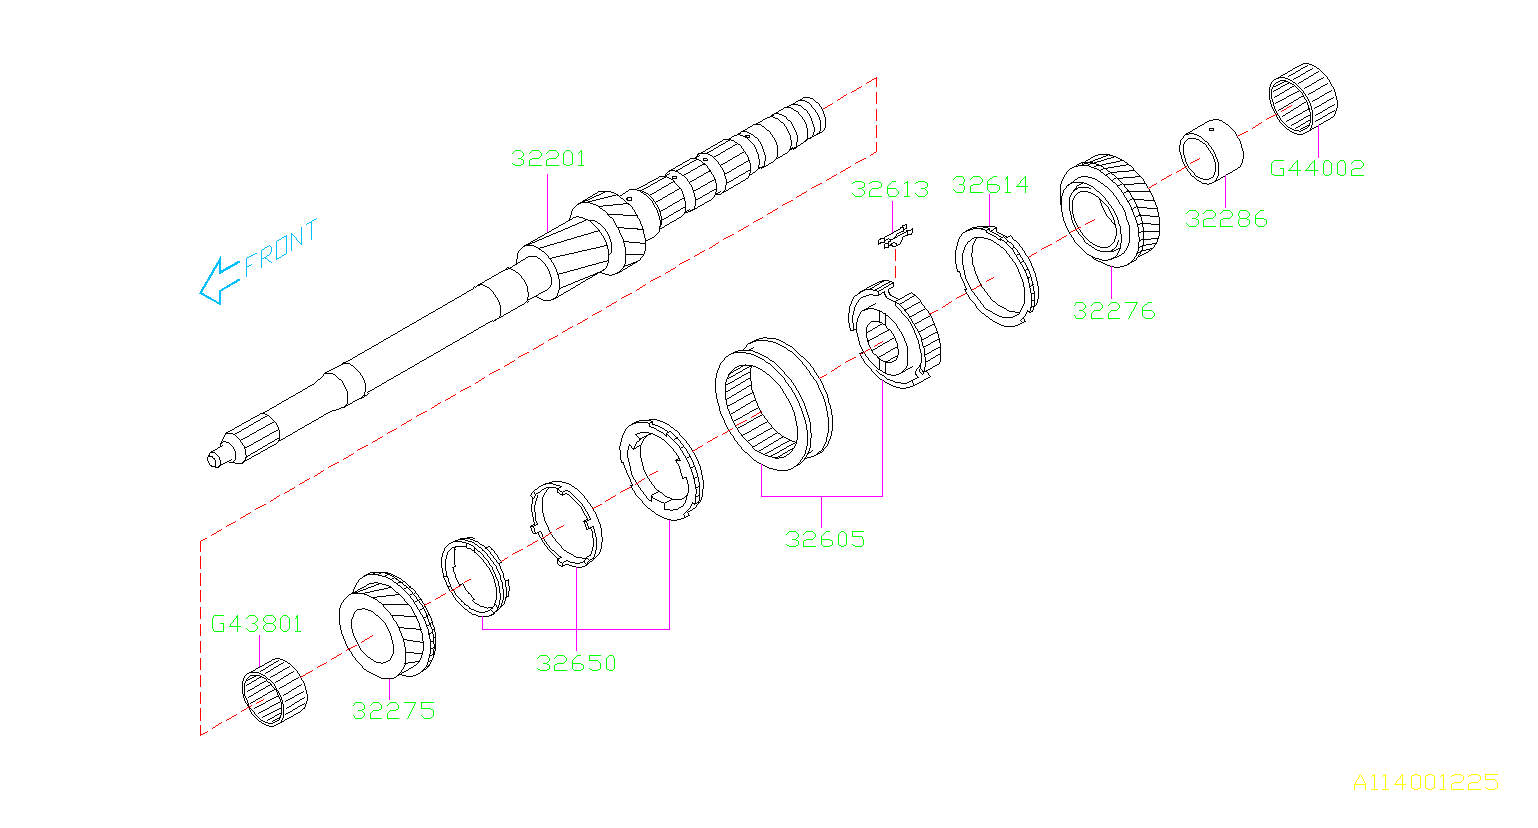 Subaru Legacy Gear complete-4th drive. Transmission, shaft